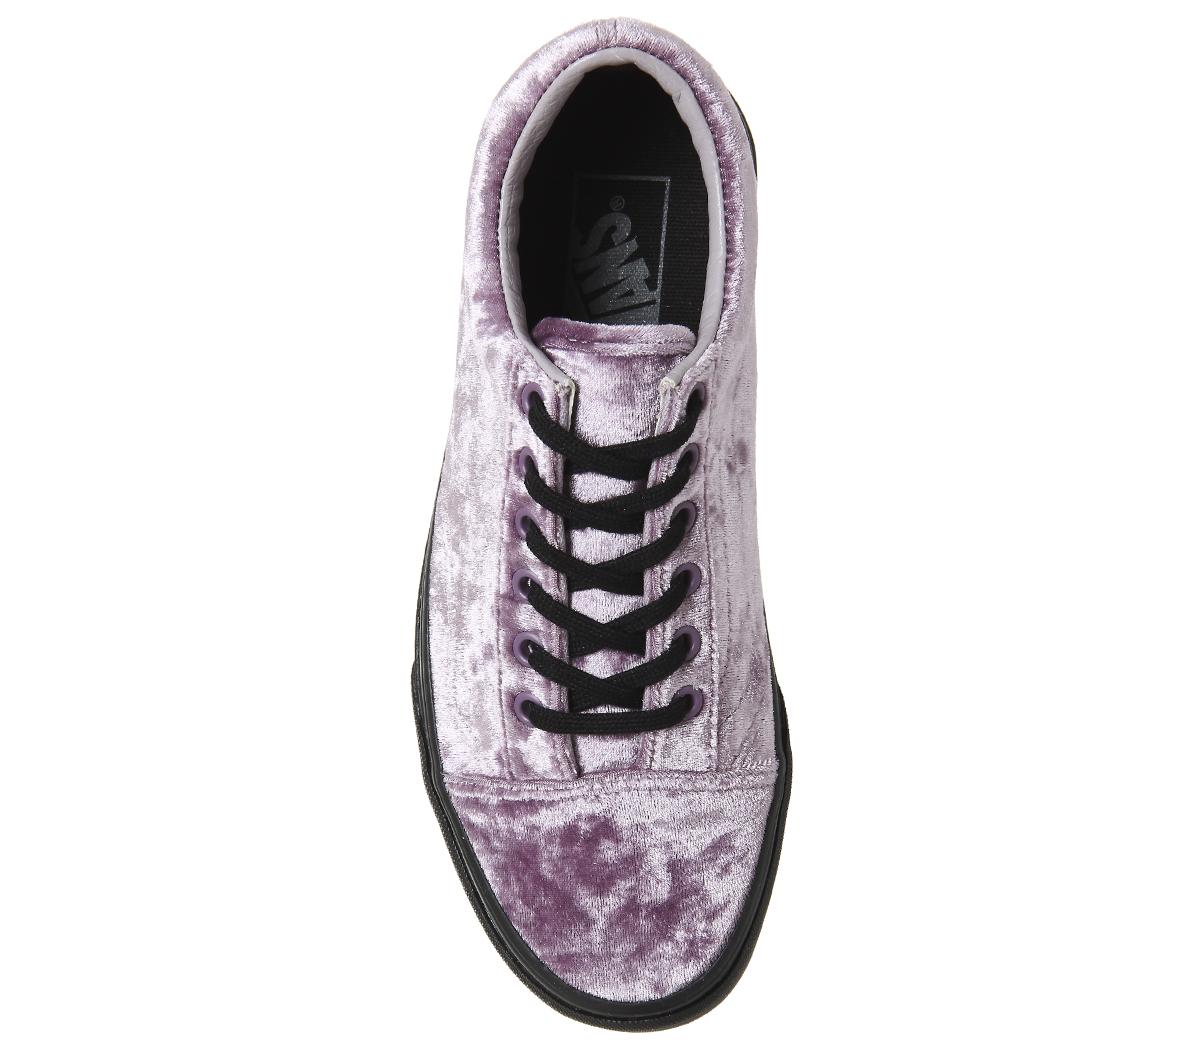 85efdb6aa4ac95 Sentinel Womens Vans Old Skool Trainers VELVET SEA FOG BLACK Trainers Shoes